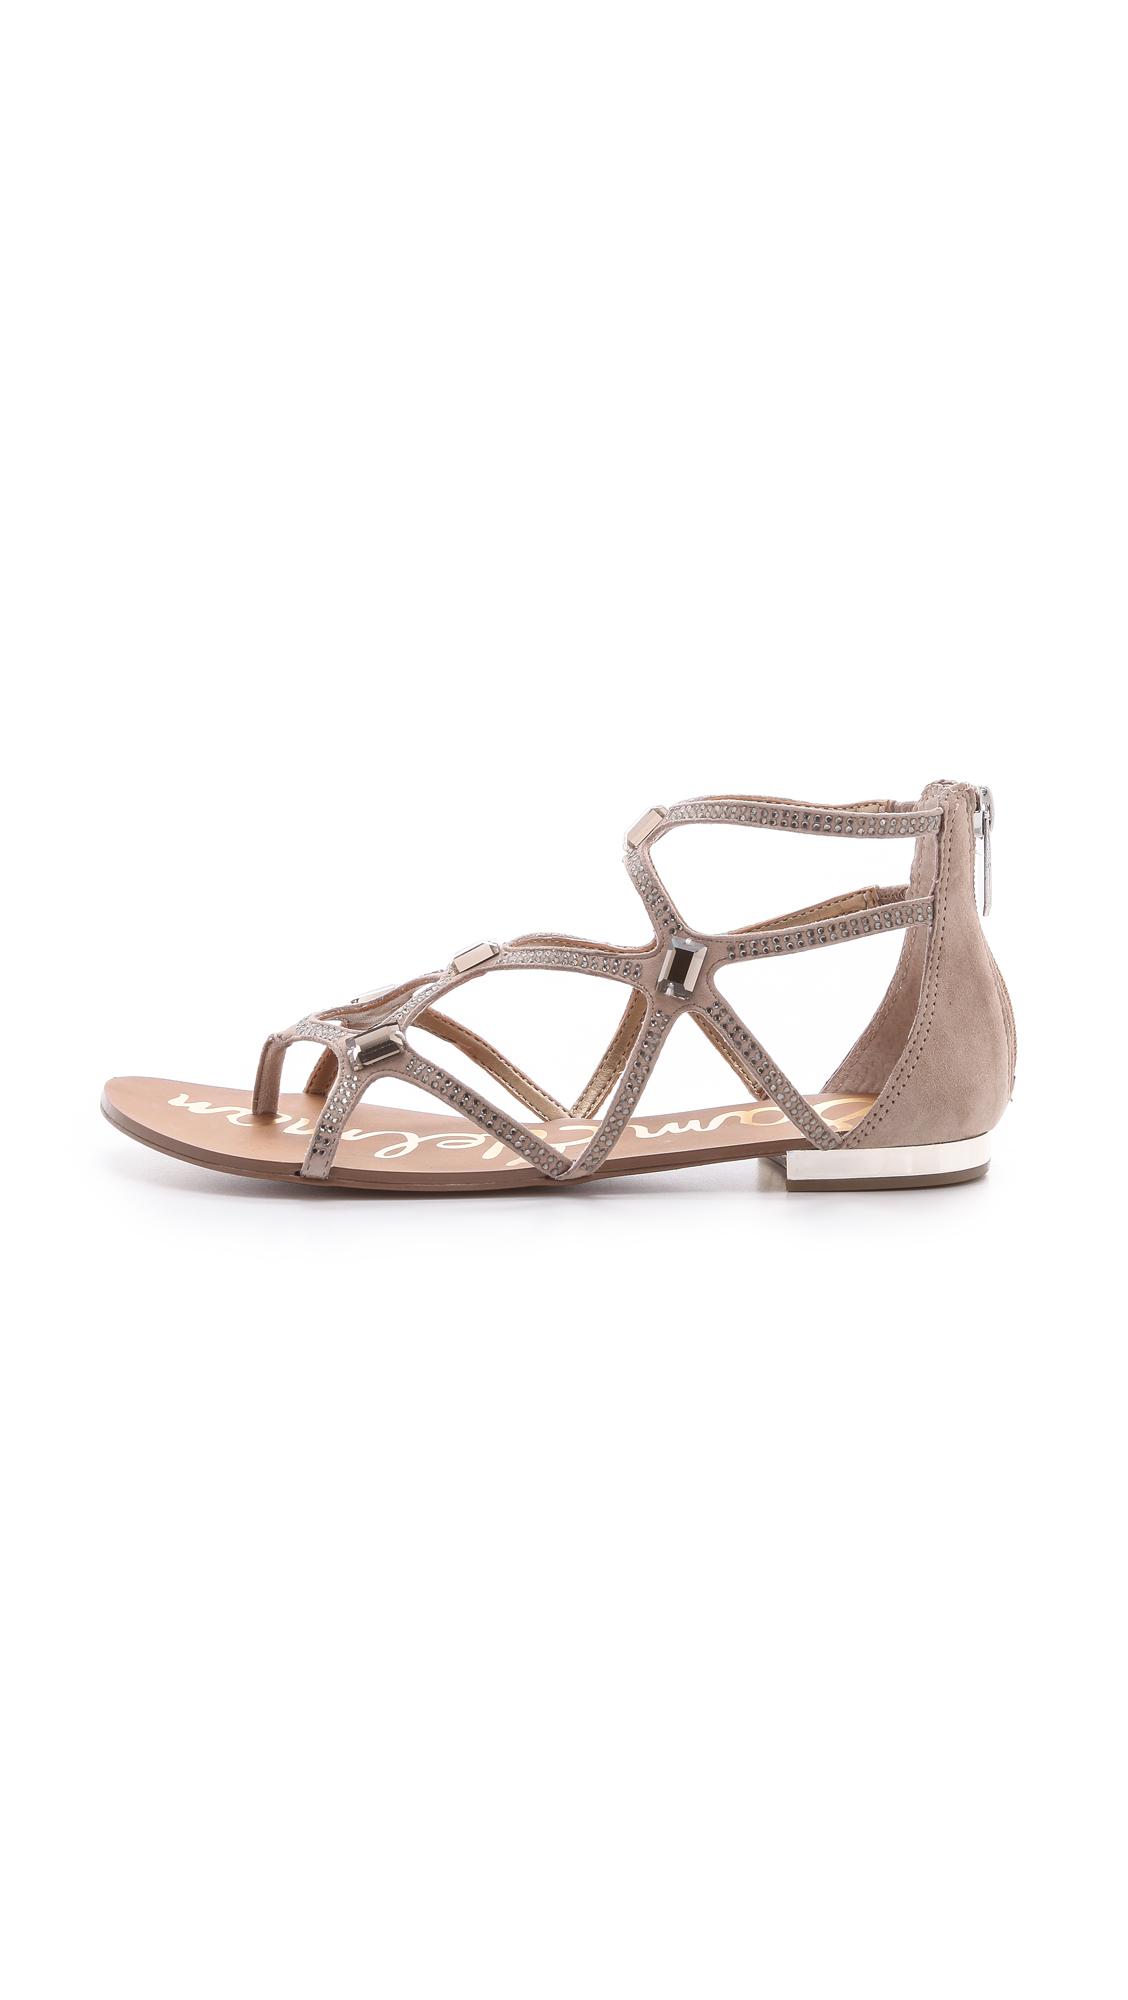 60d24e26aa6294 Lyst - Sam Edelman Tamara Strappy Sandals in Natural